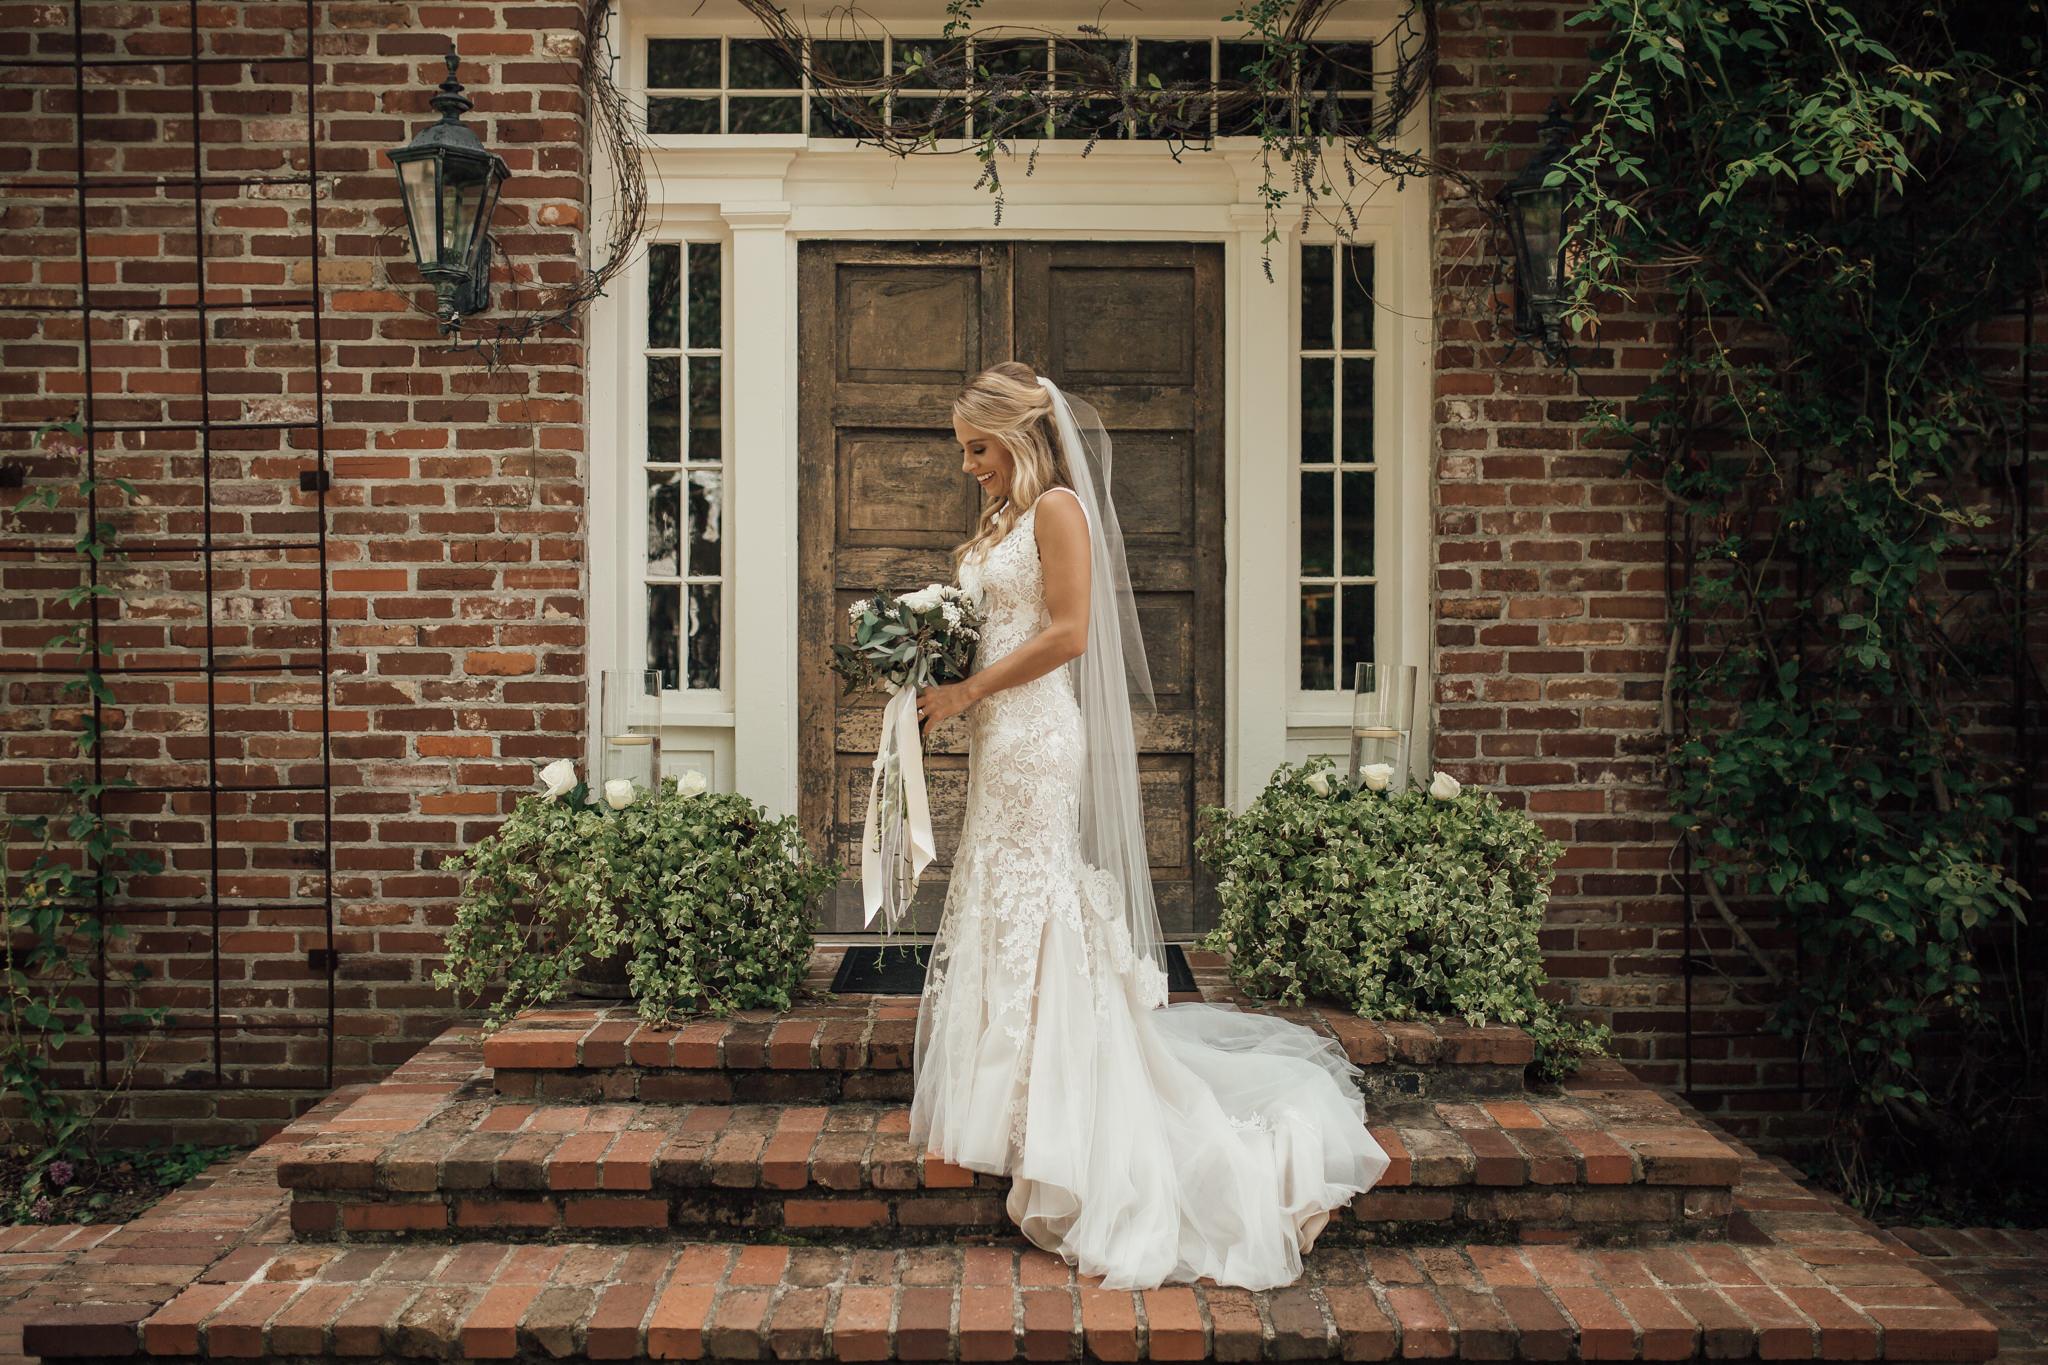 cassie-cook-photography-memphis-wedding-photographer-hedge-farm-wedding-venue-91.jpg